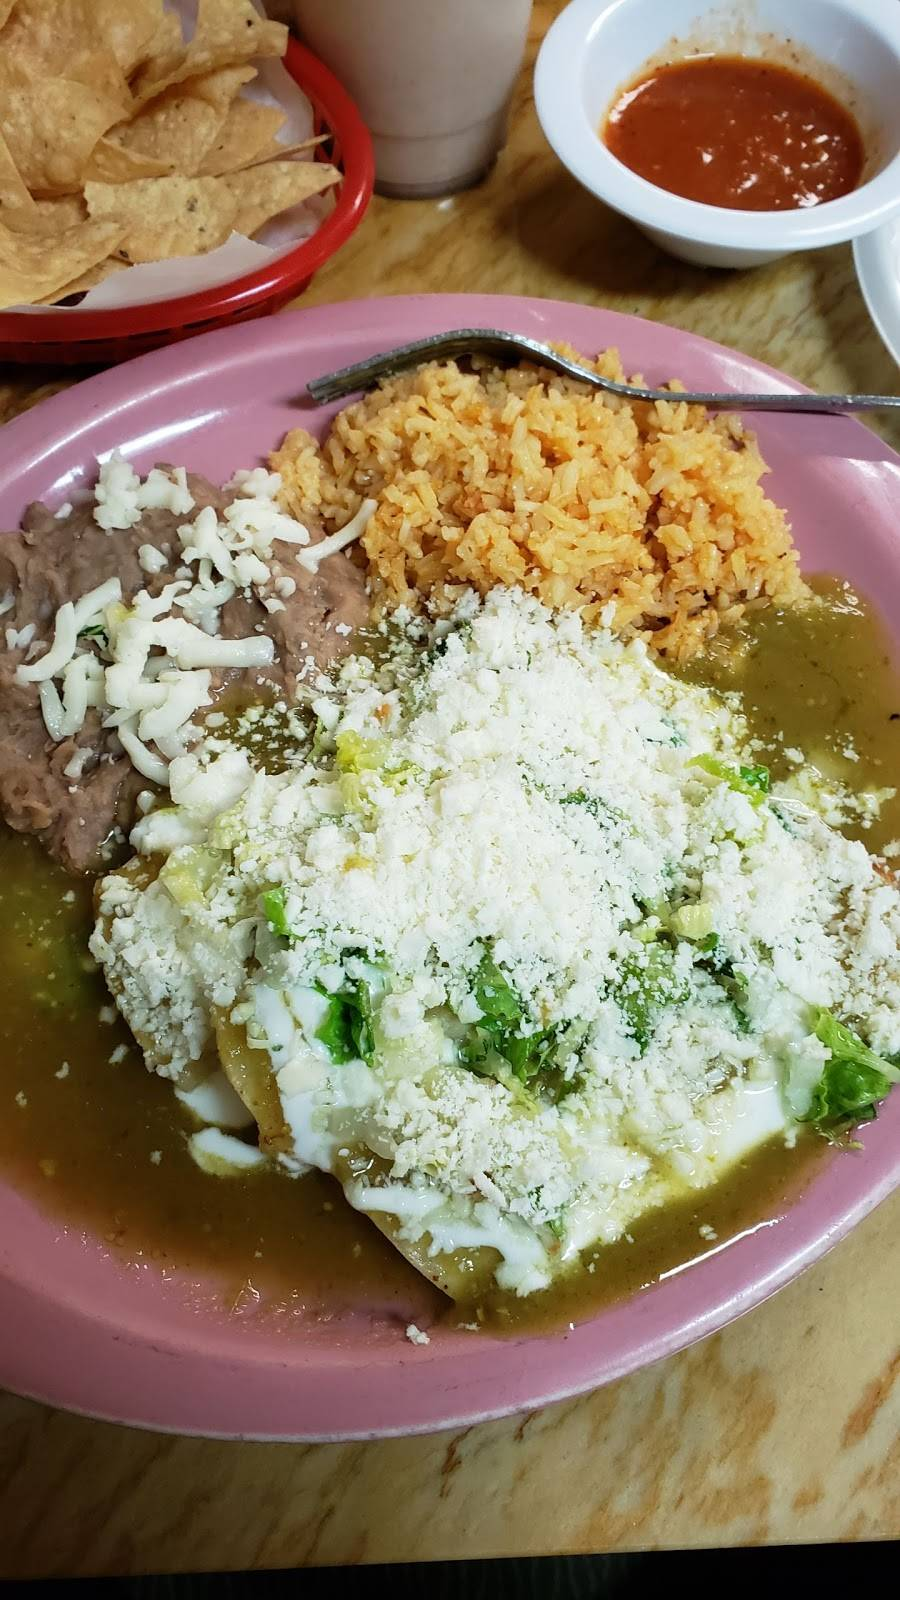 Taqueria Garcia | restaurant | 500 S Euclid St # G, Anaheim, CA 92802, USA | 7147726862 OR +1 714-772-6862